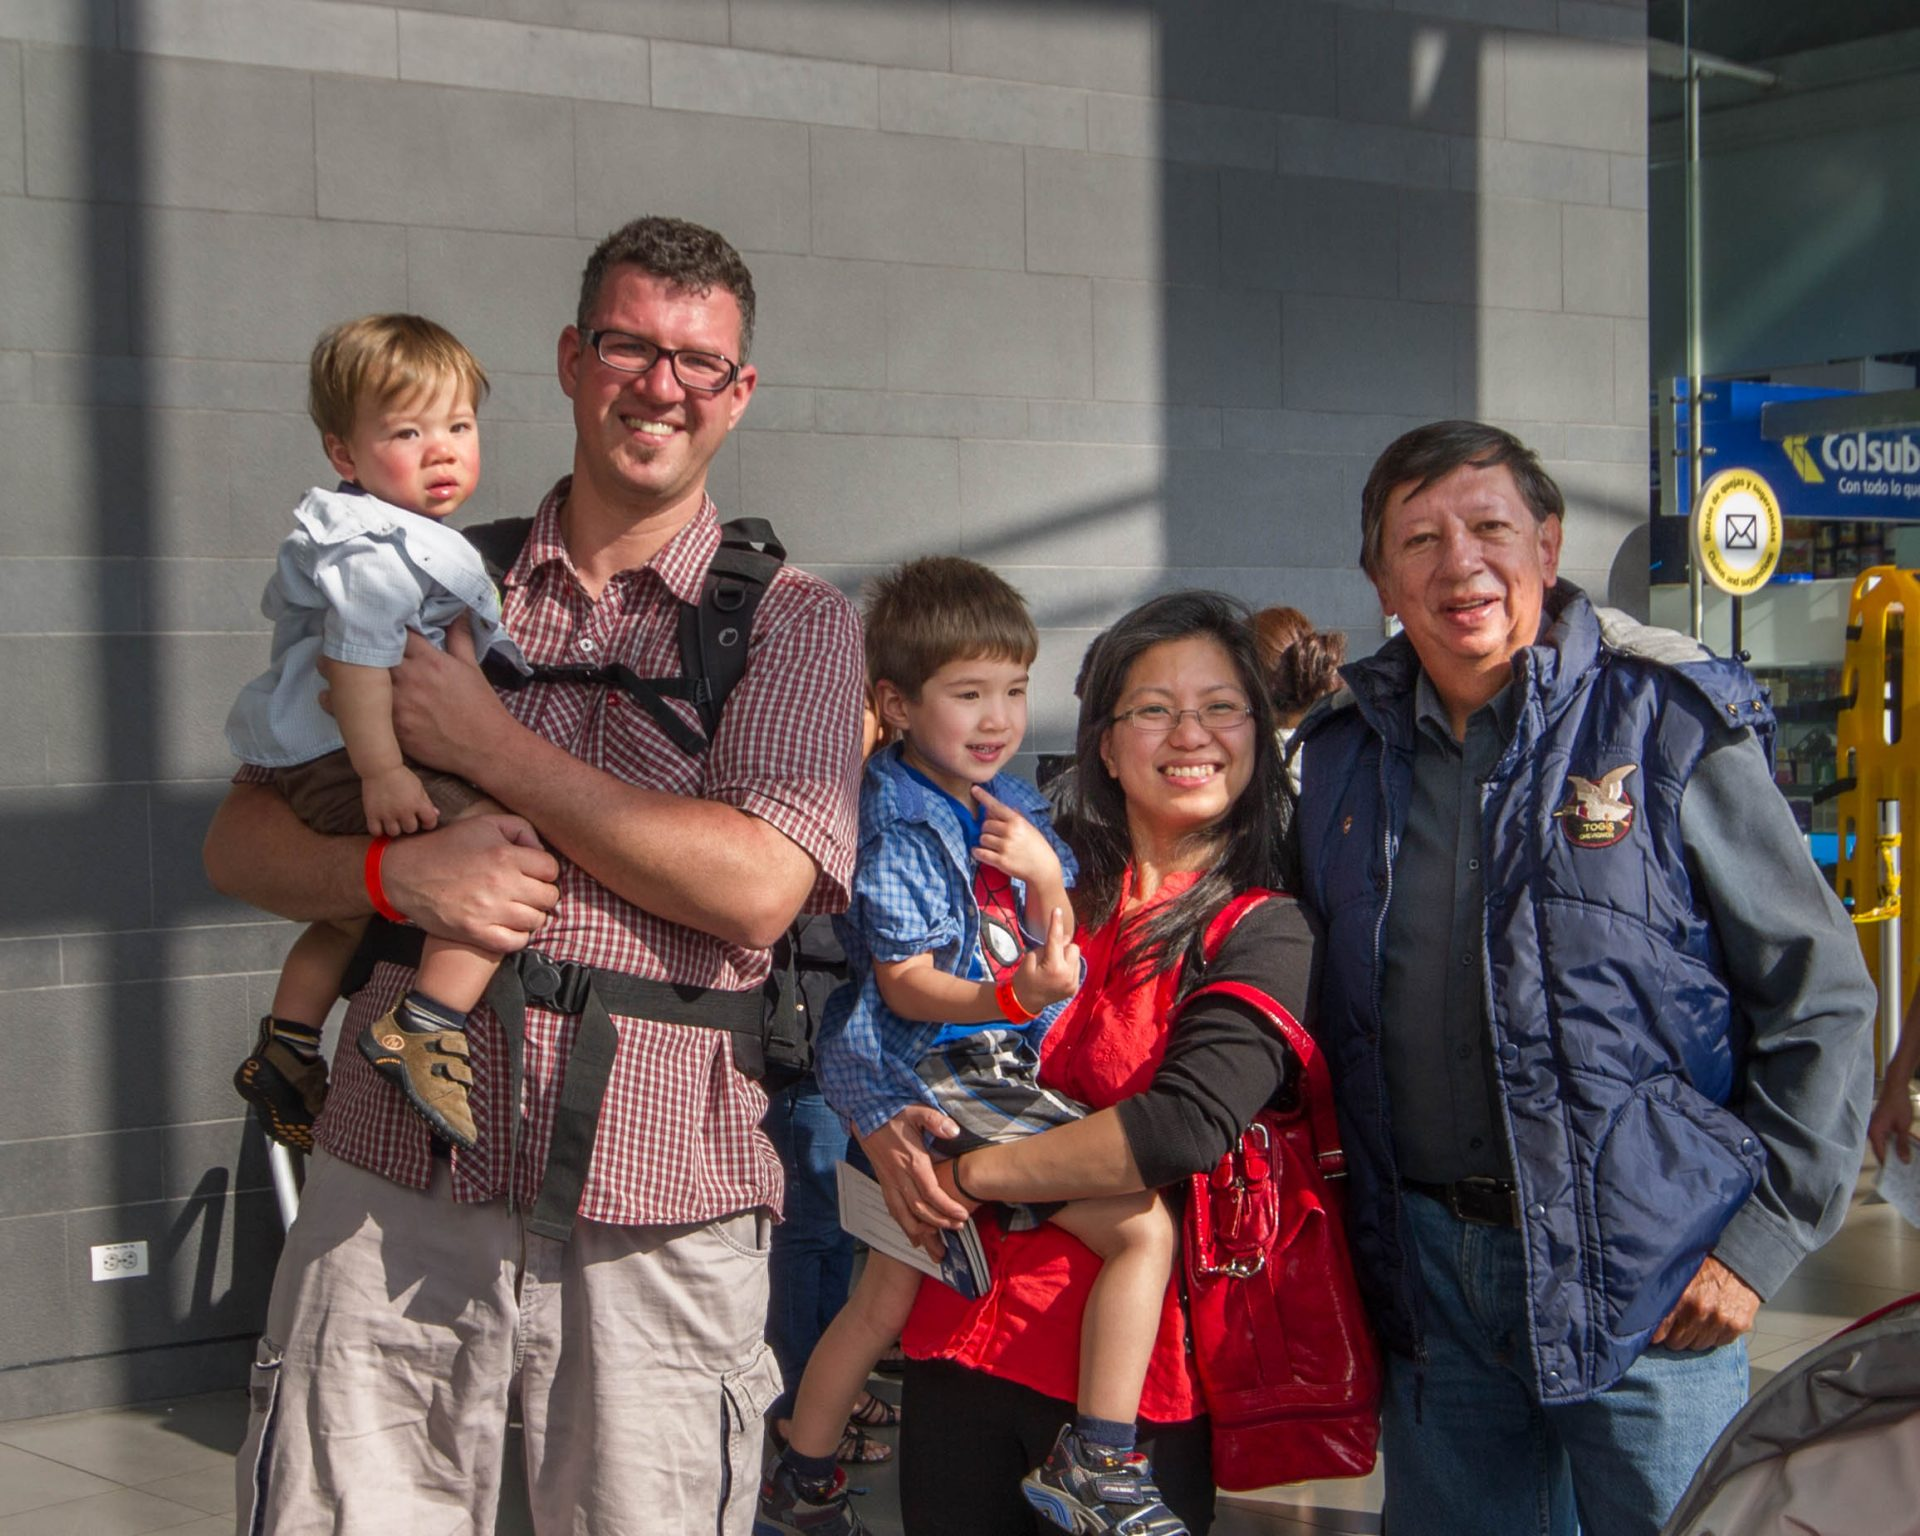 Men, woman and children pose in the Bogota airport.